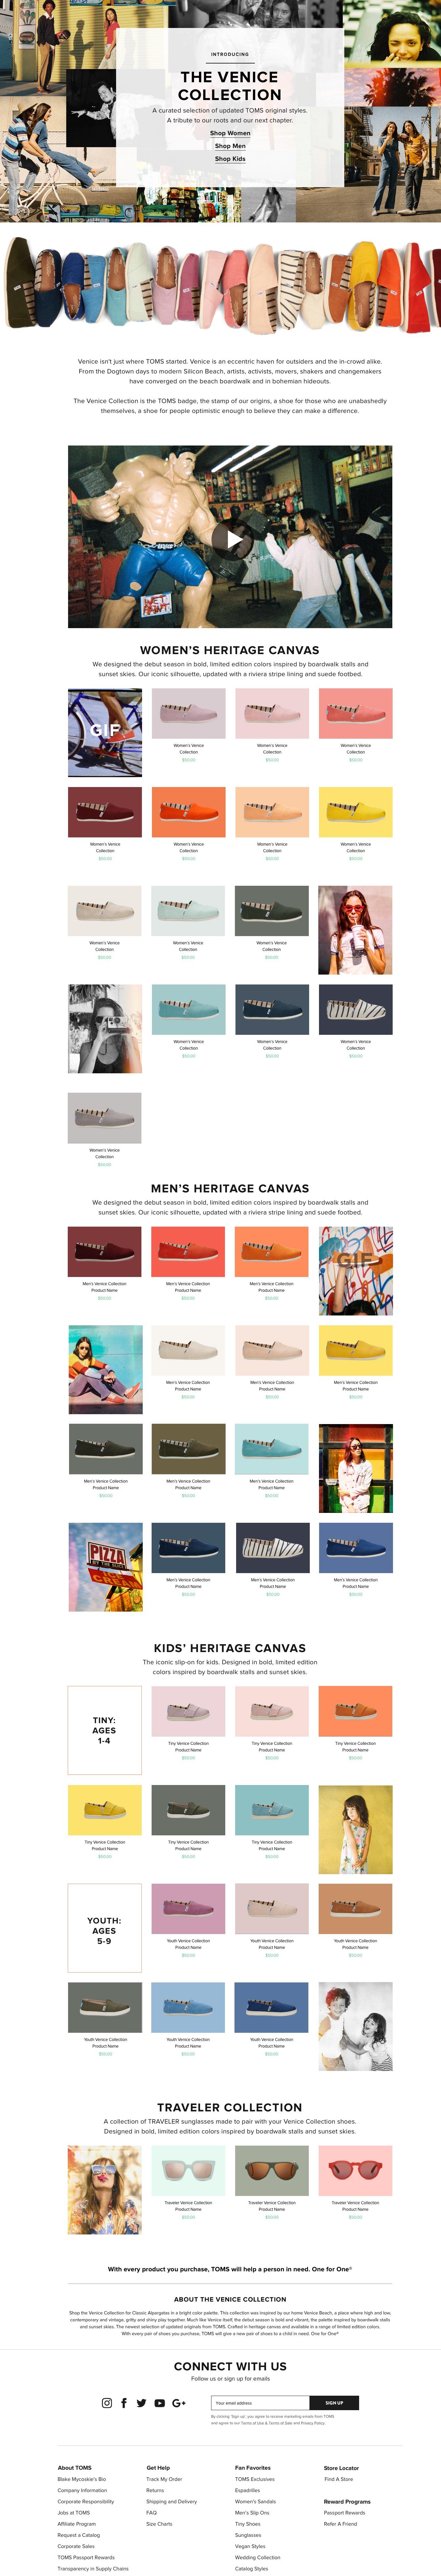 Venice+Collection+LP.jpg